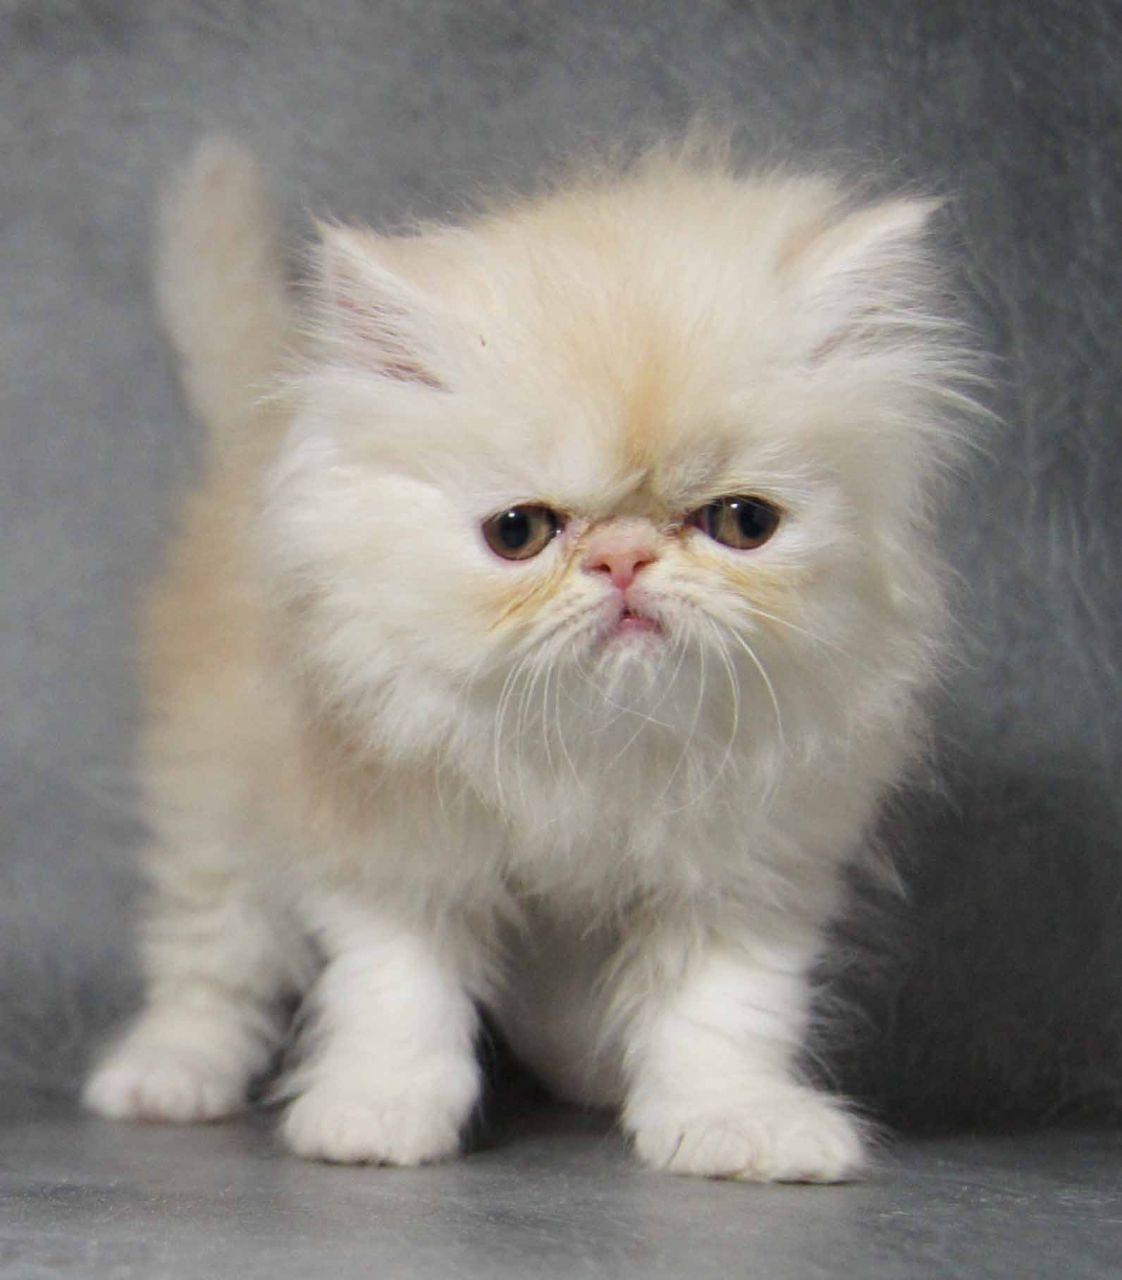 Teacup Persian Cat Persian kittens for sale, Teacup